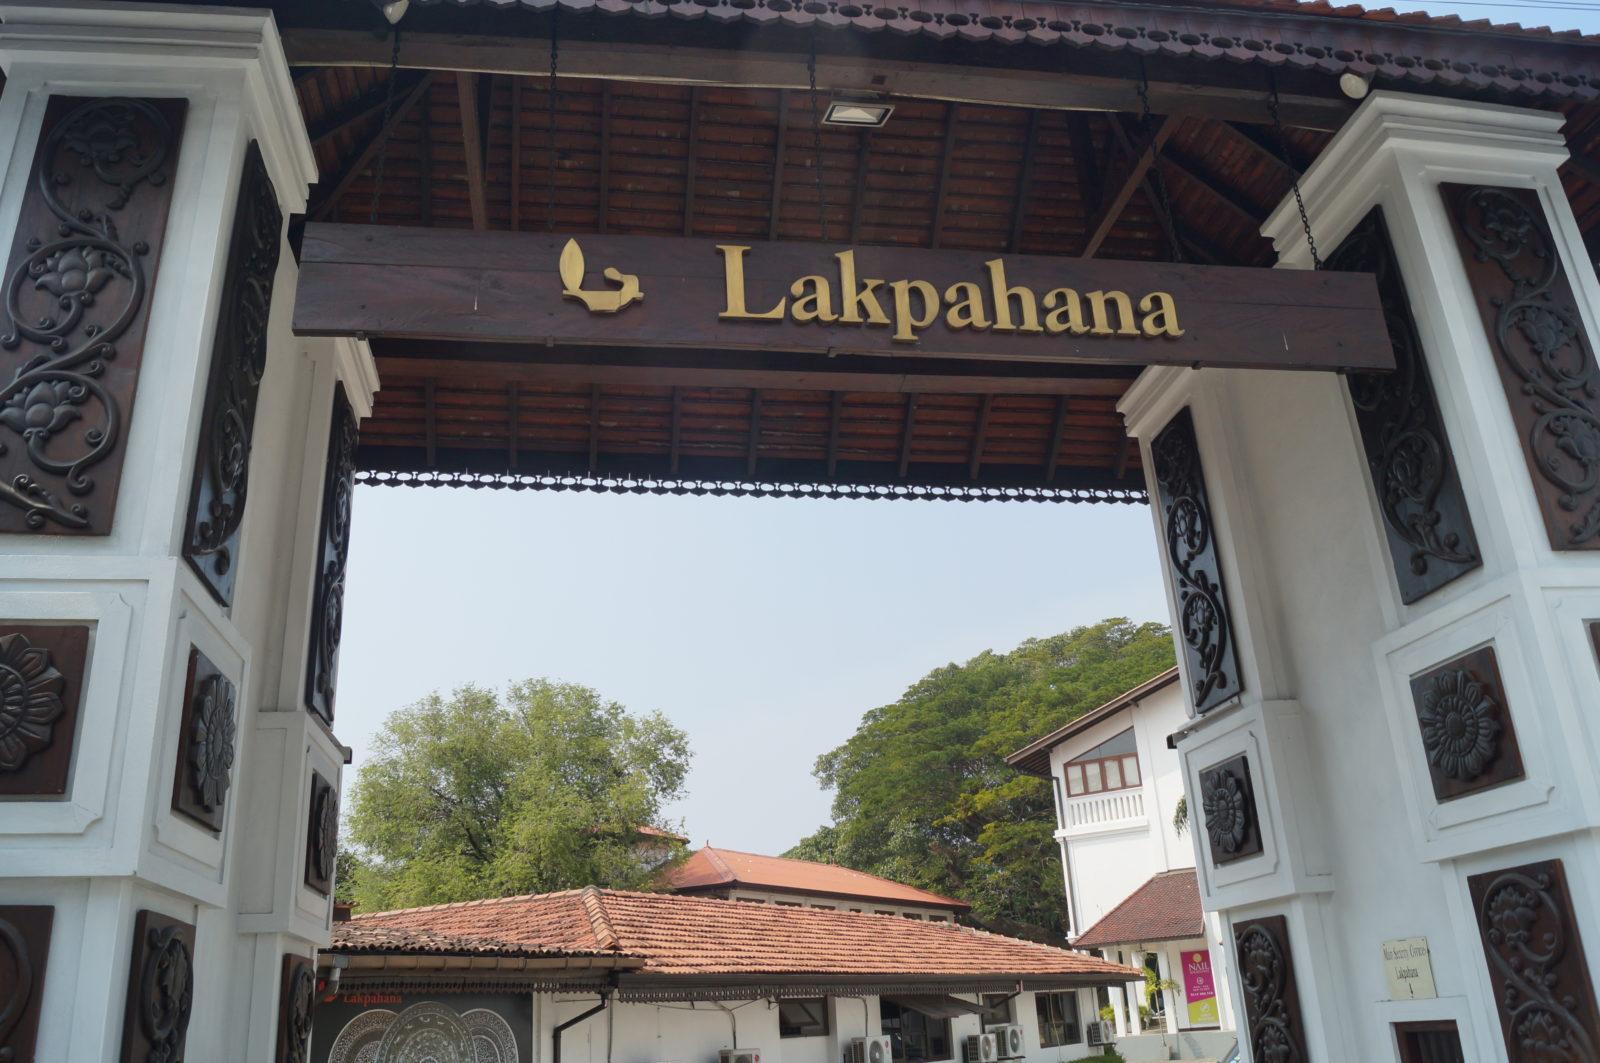 Lakpahana souvenir craft shop, Colombo – on the map | Sri Lanka Finder